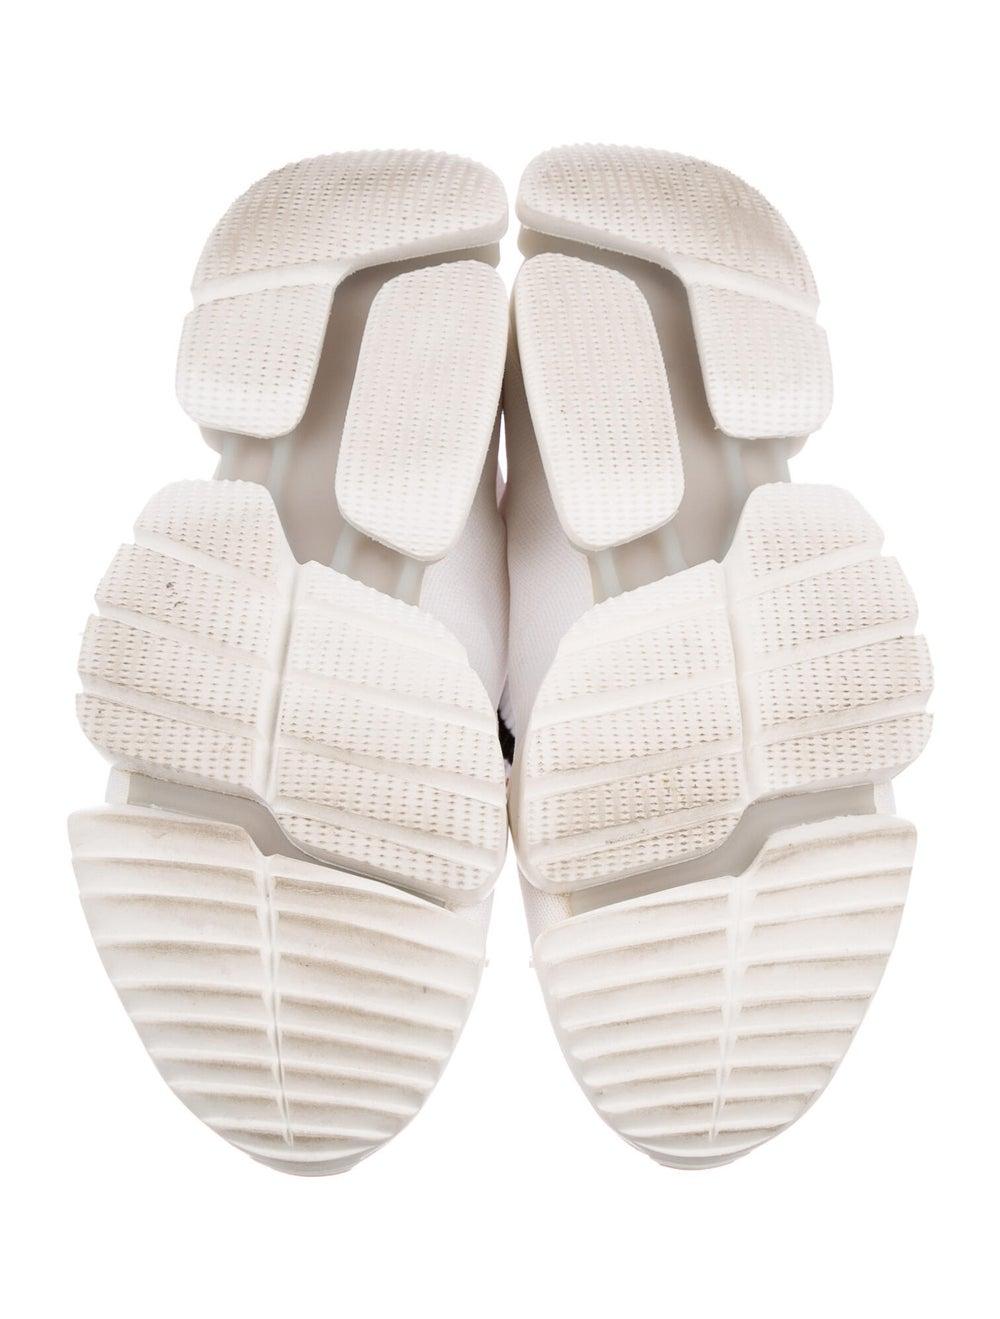 Vetements x Reebok Sock Pump High-Top Sock Sneake… - image 5